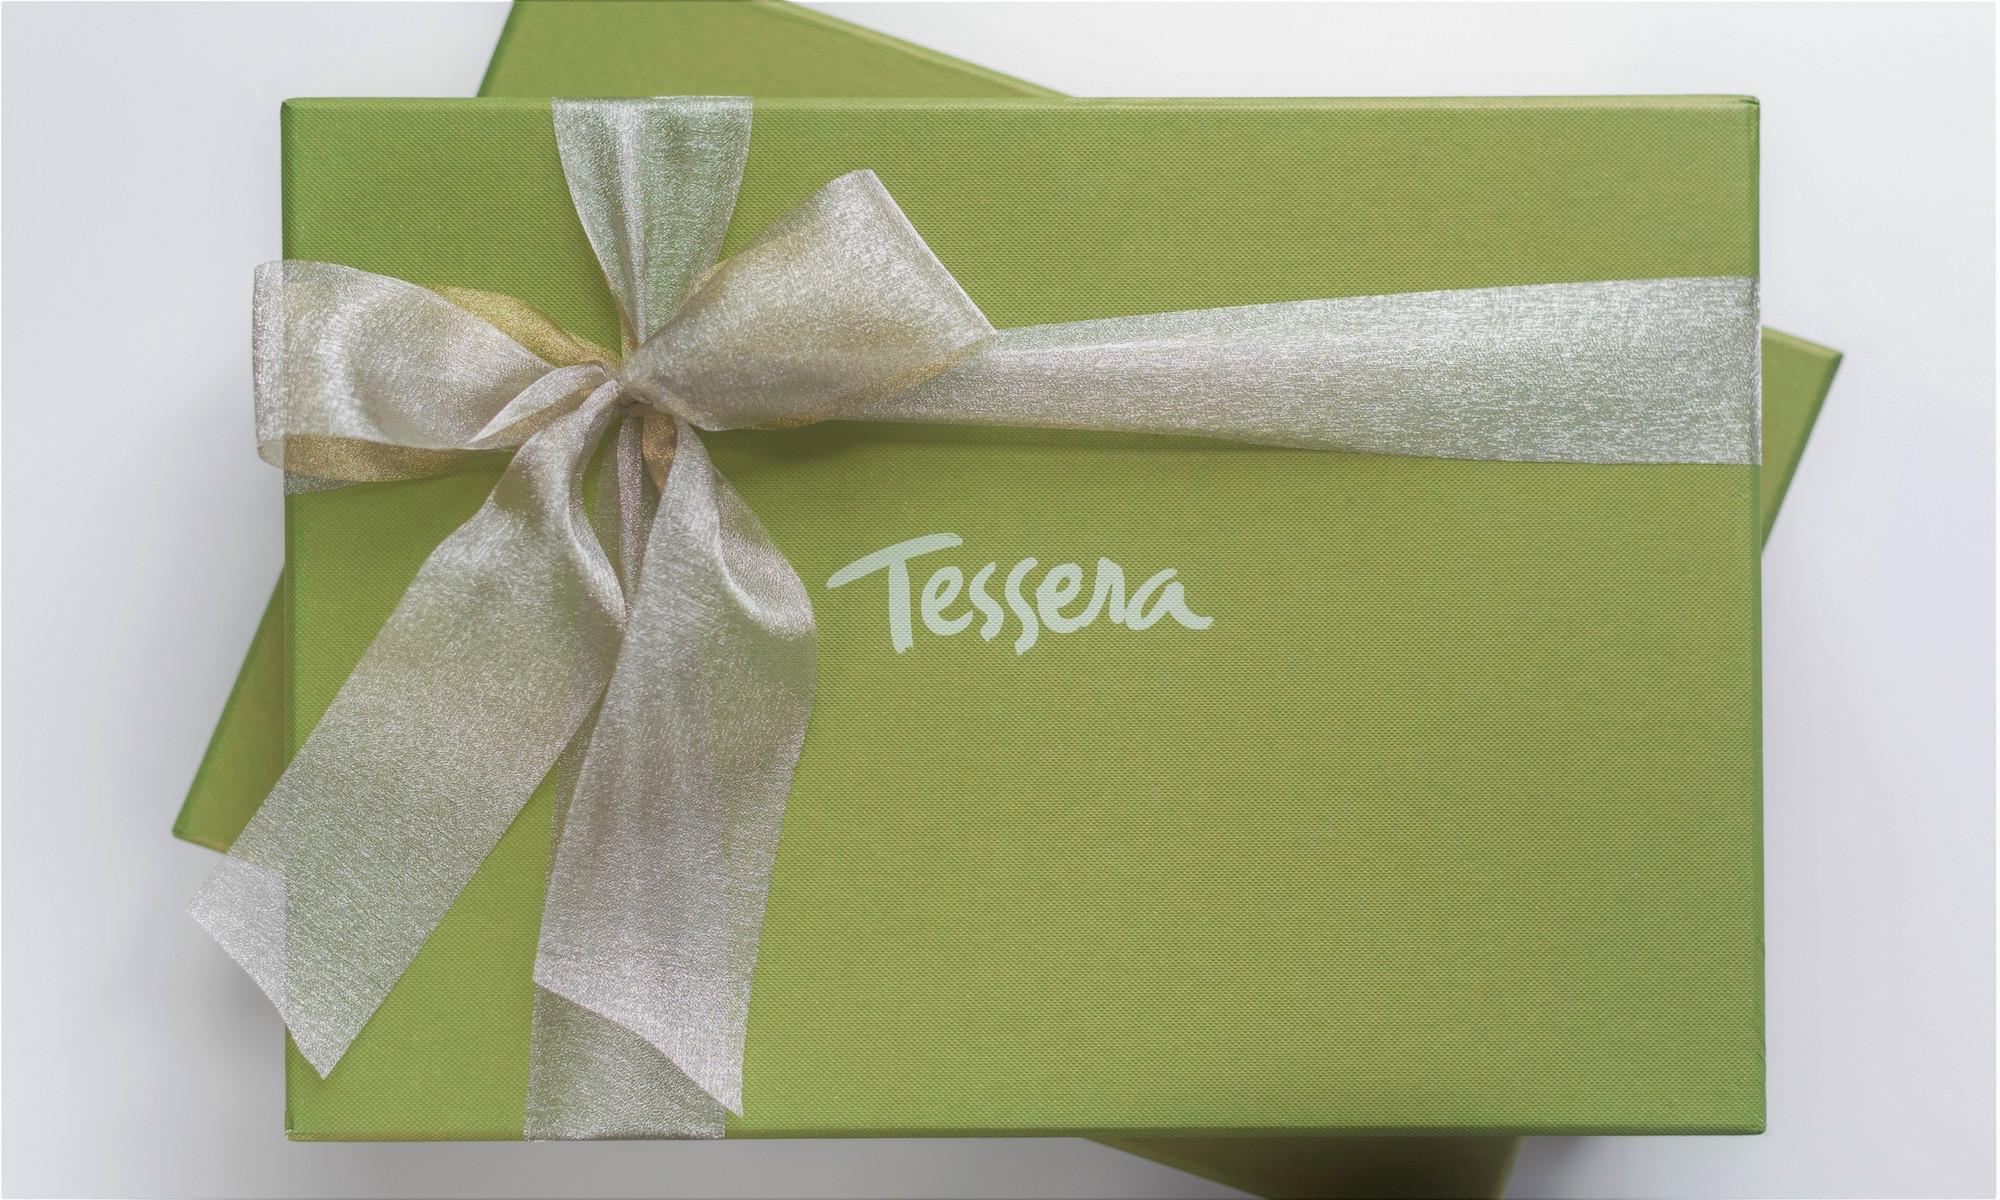 Green Tessera Gift Box with Ribbon